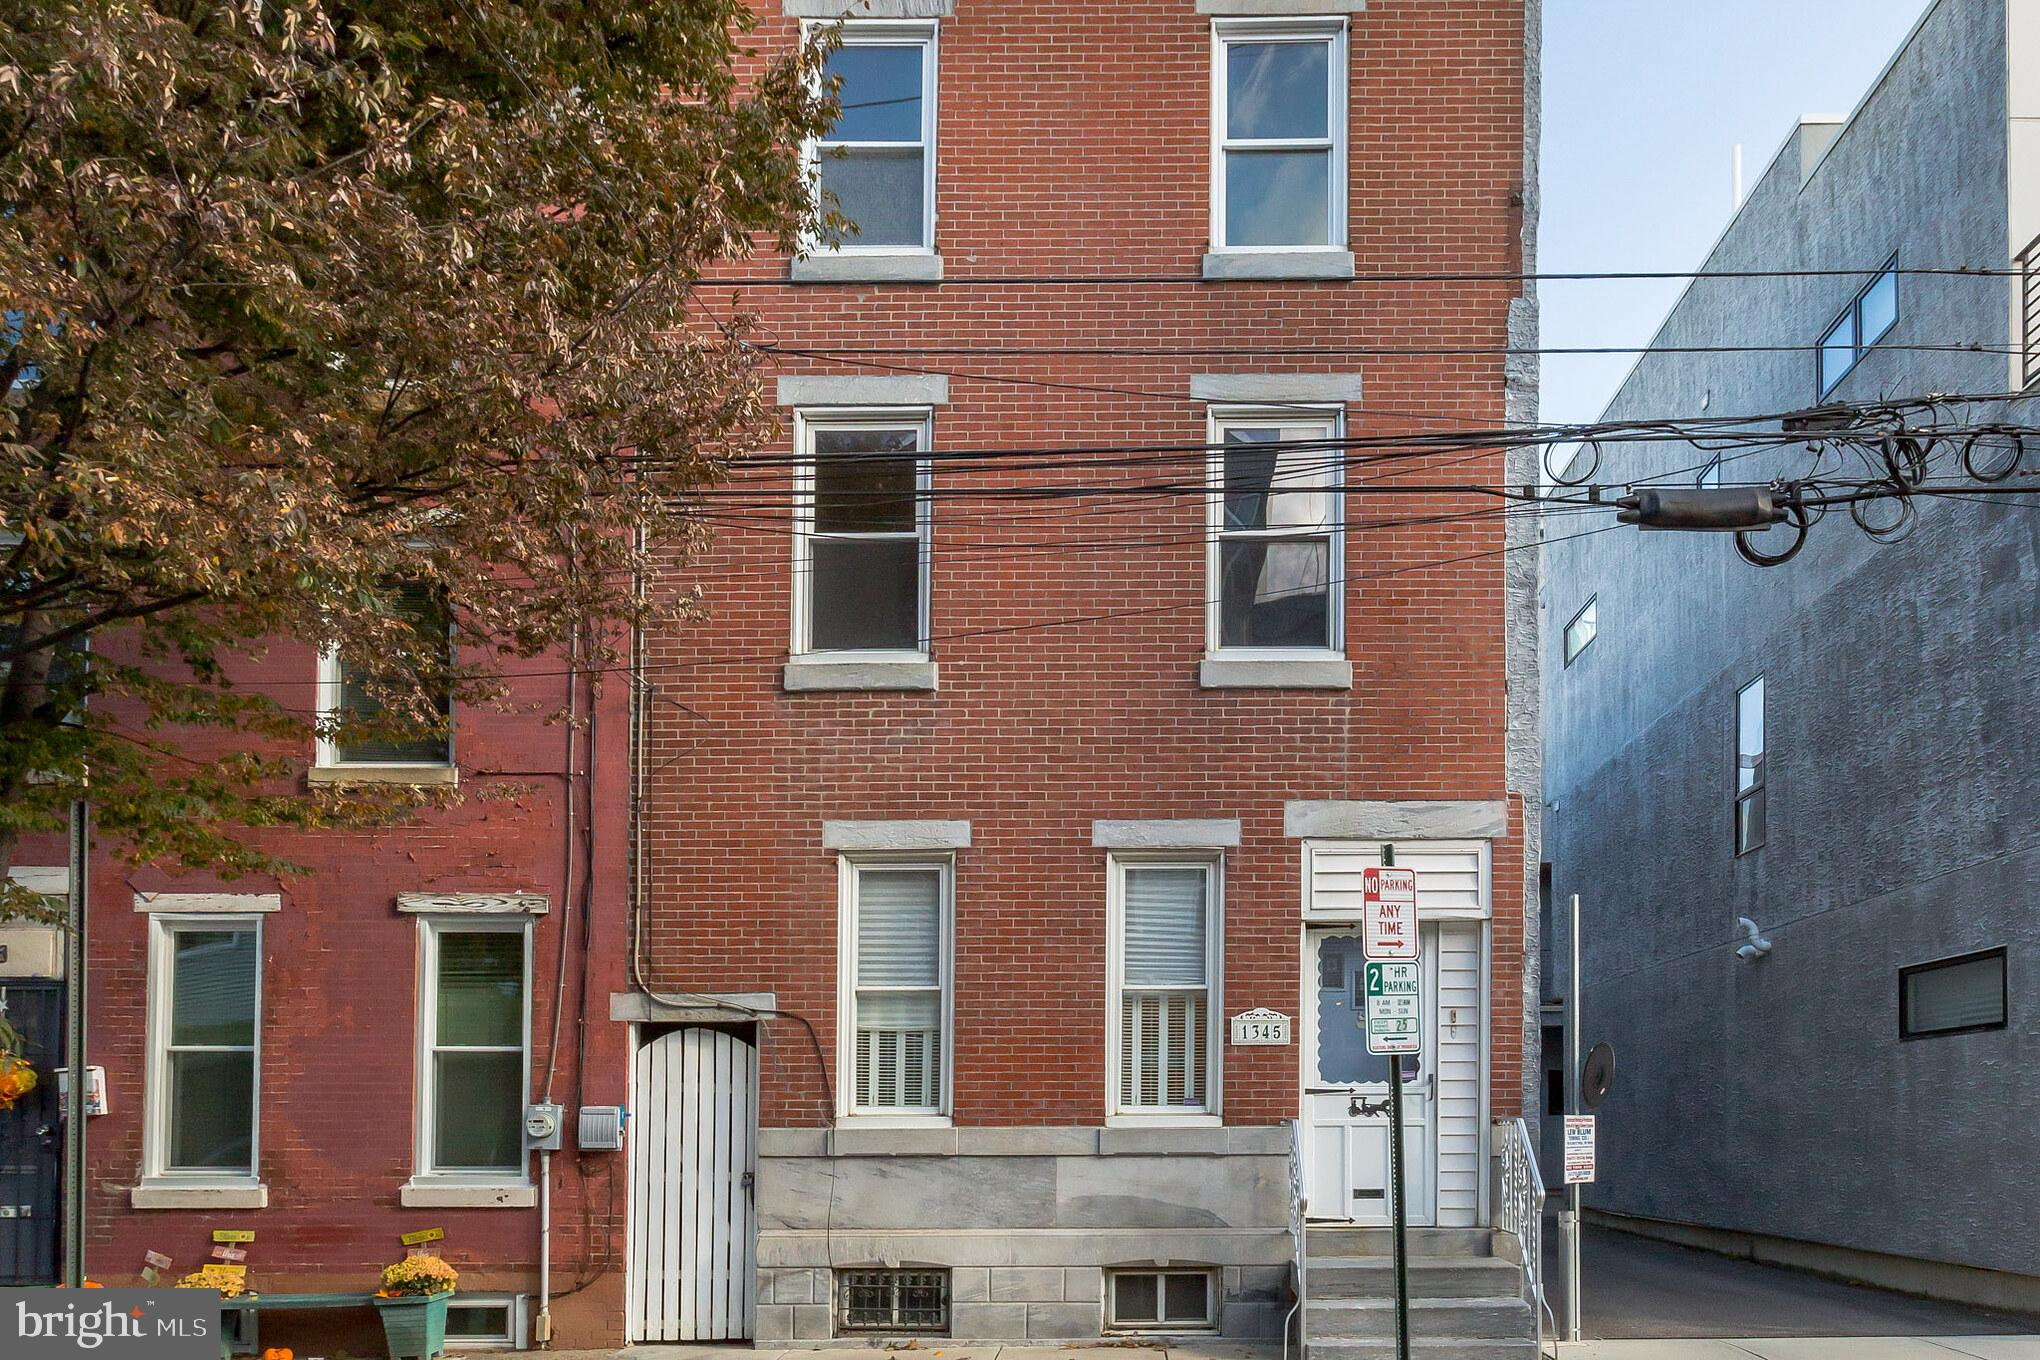 1345 N HOWARD STREET, PHILADELPHIA, PA 19122